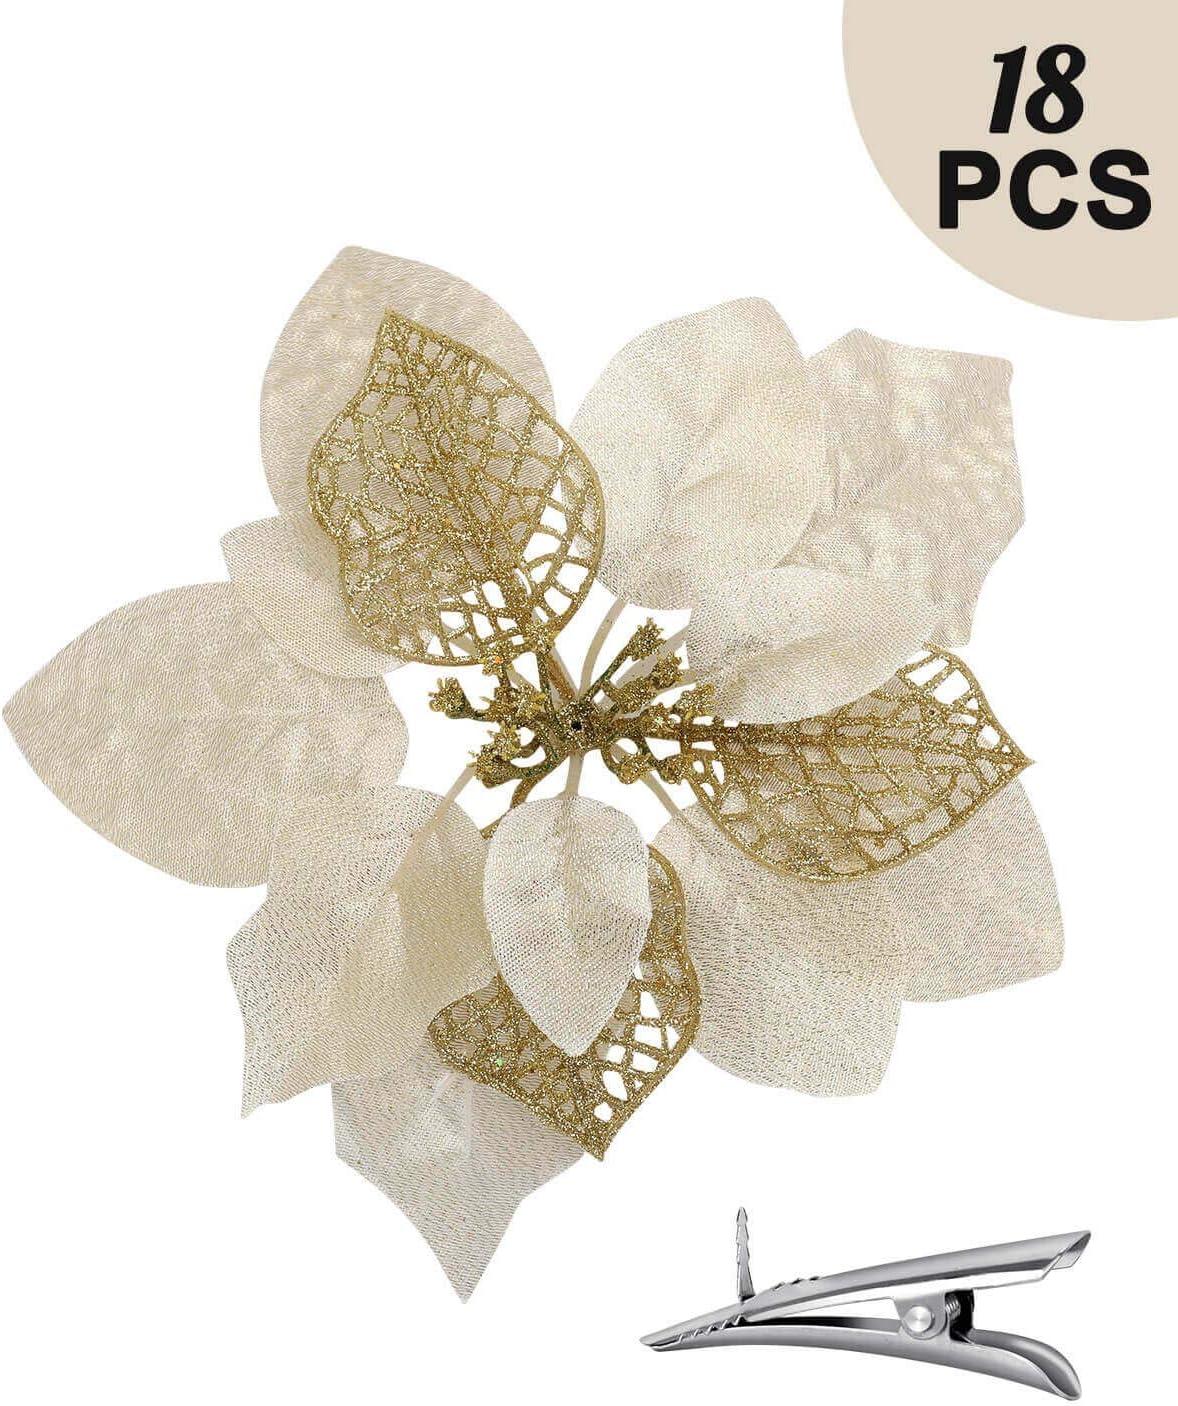 18PCS Poinsettia Flowers for Tree Skirt Christmas Decorations - Gold Christmas Flowers Artificial for Decoration, Christmas Ornament Picks Good for Christmas Tree Wreath, Seasonal Wedding Deco